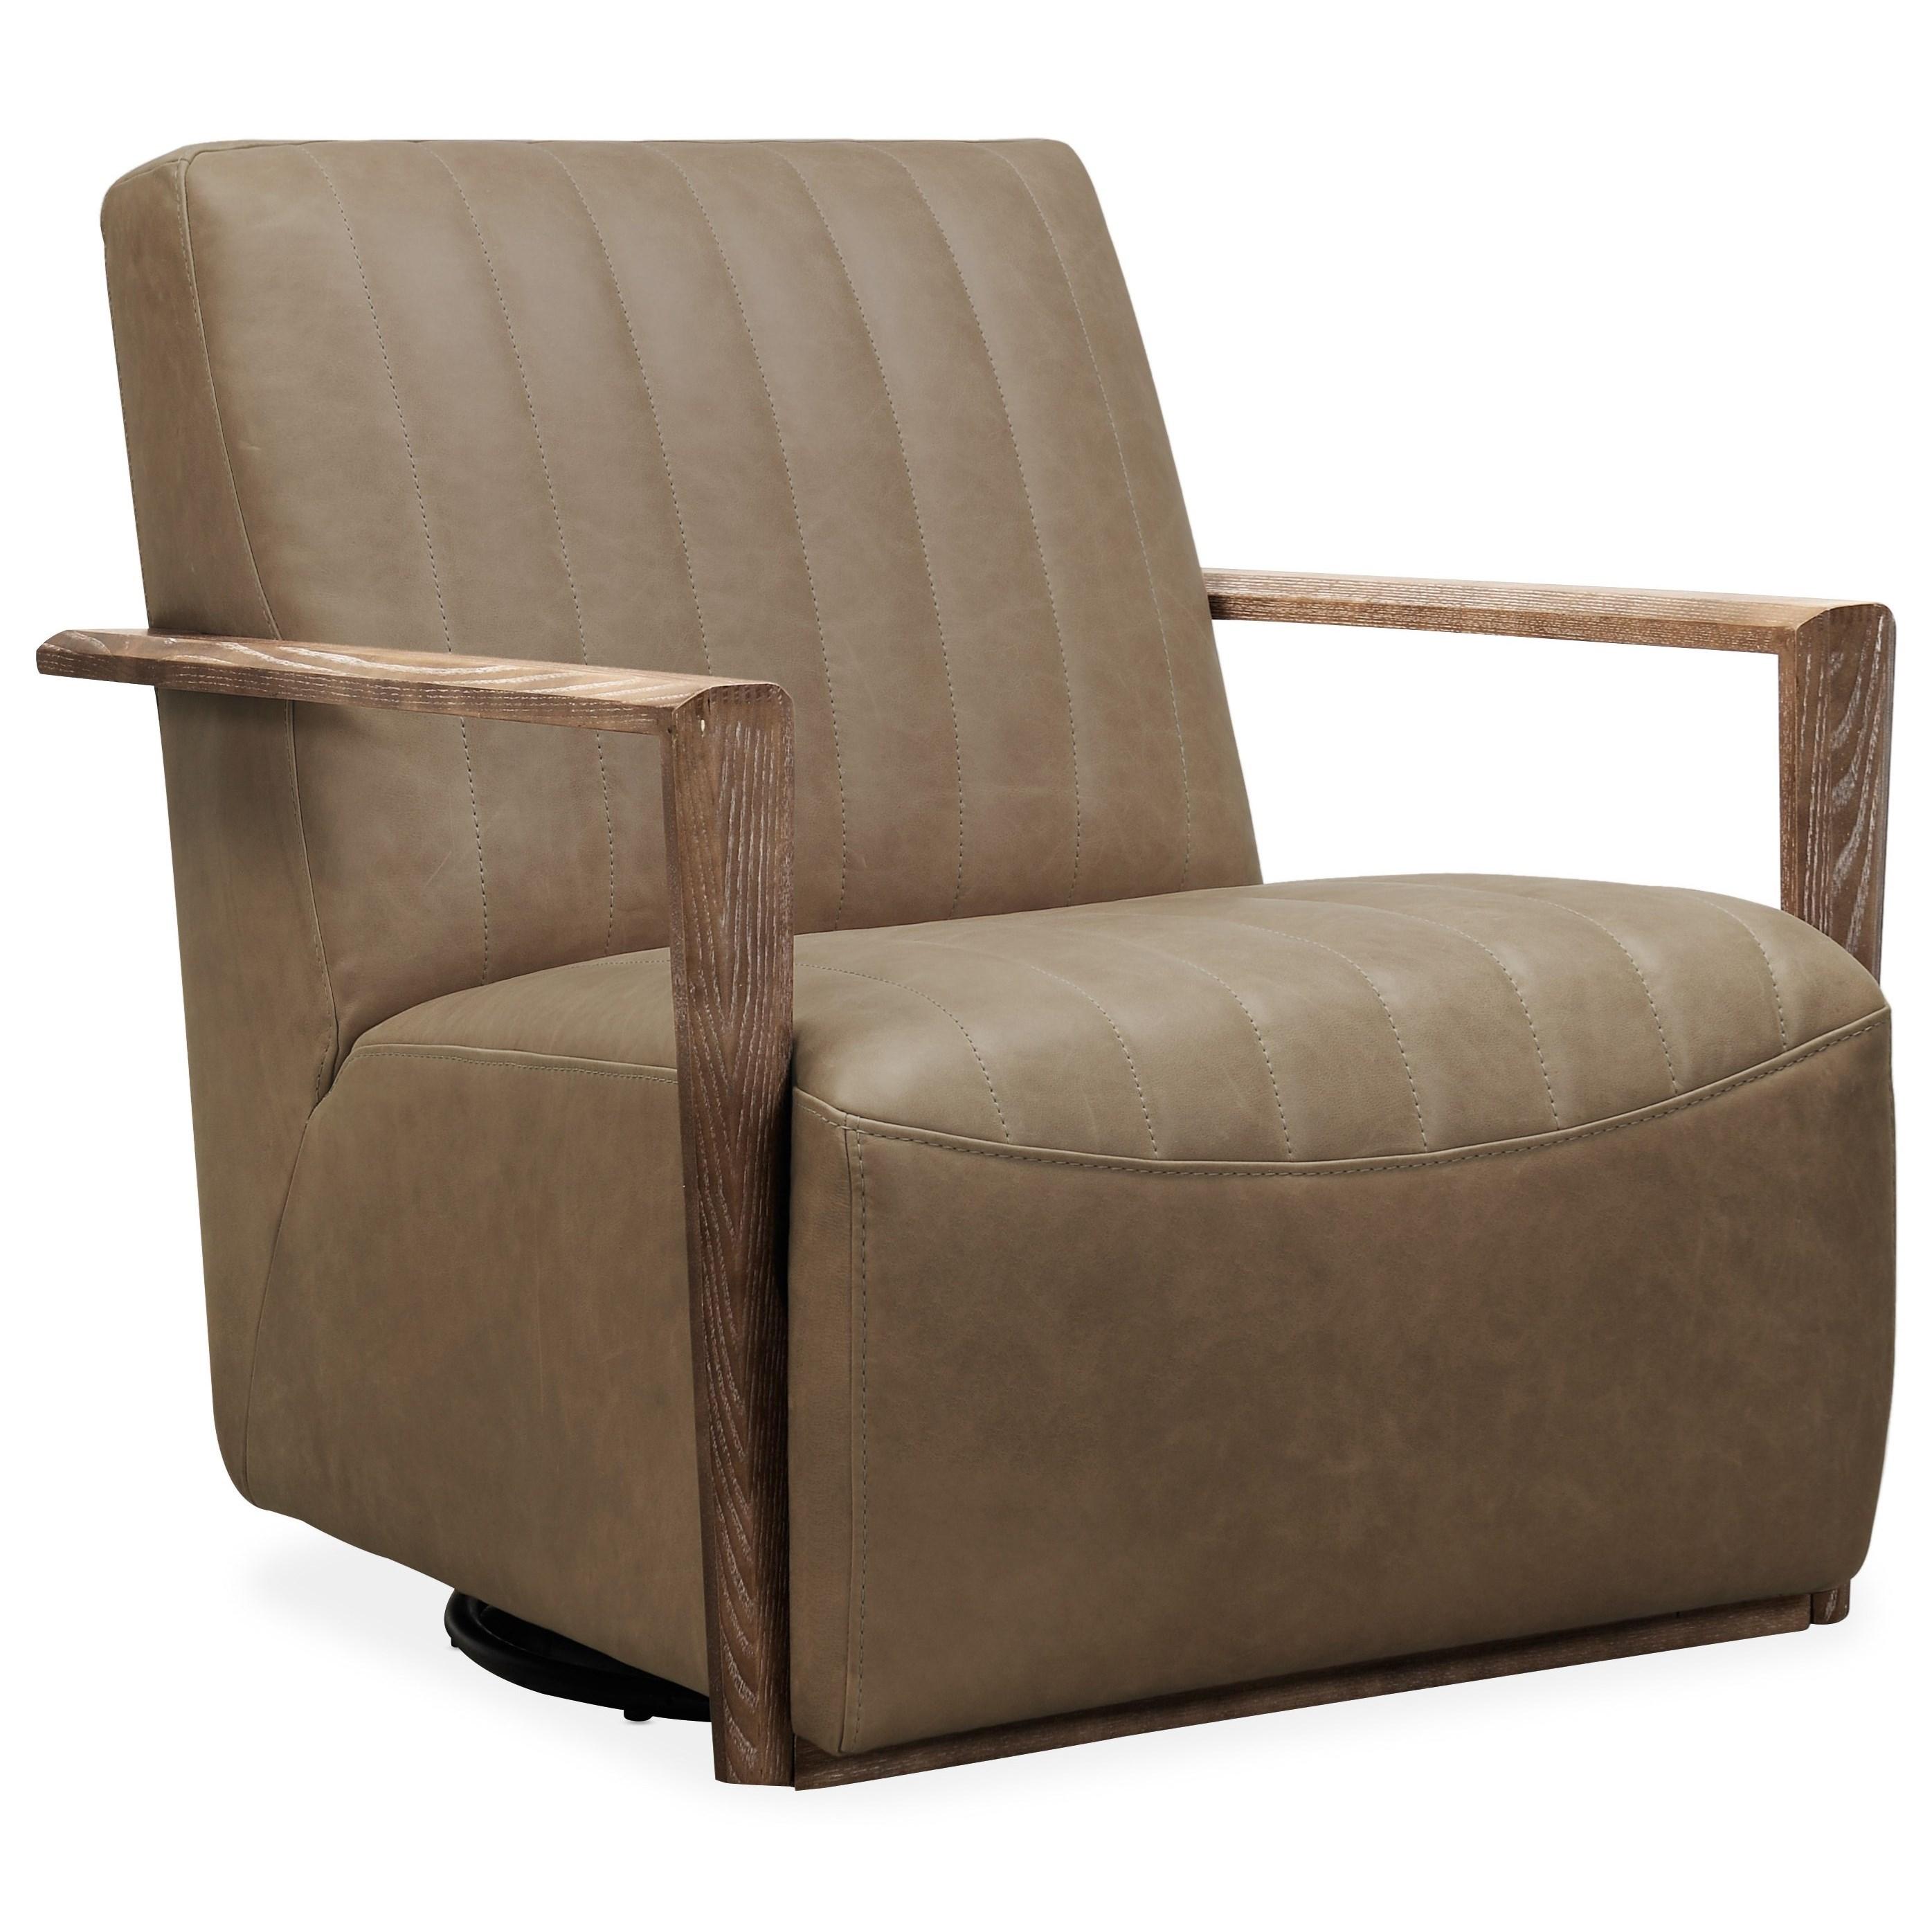 Club Chairs Sophia Swivel Club Chair by Hooker Furniture at Baer's Furniture